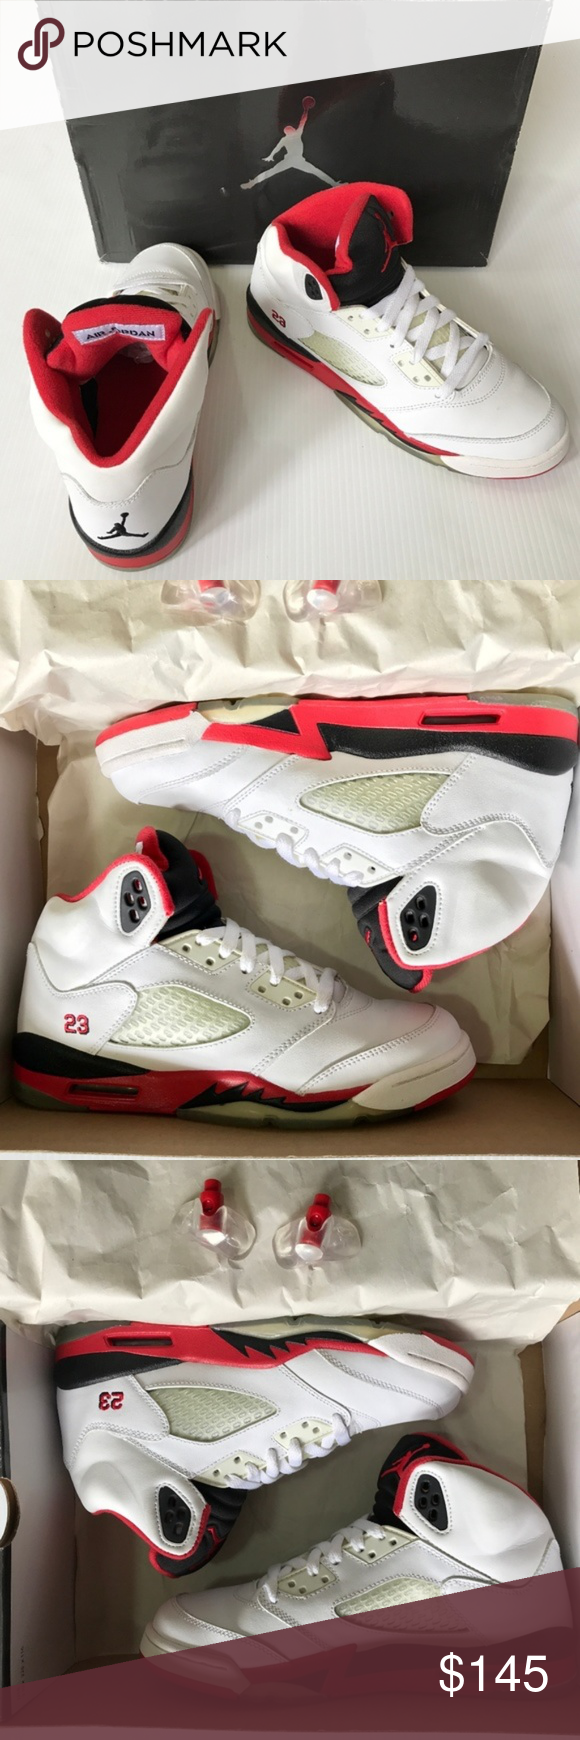 separation shoes a2f5b ffd60 2006 Nike Air Jordan Retro (GS) 5 V White Red, 6Y Authentic Jordan